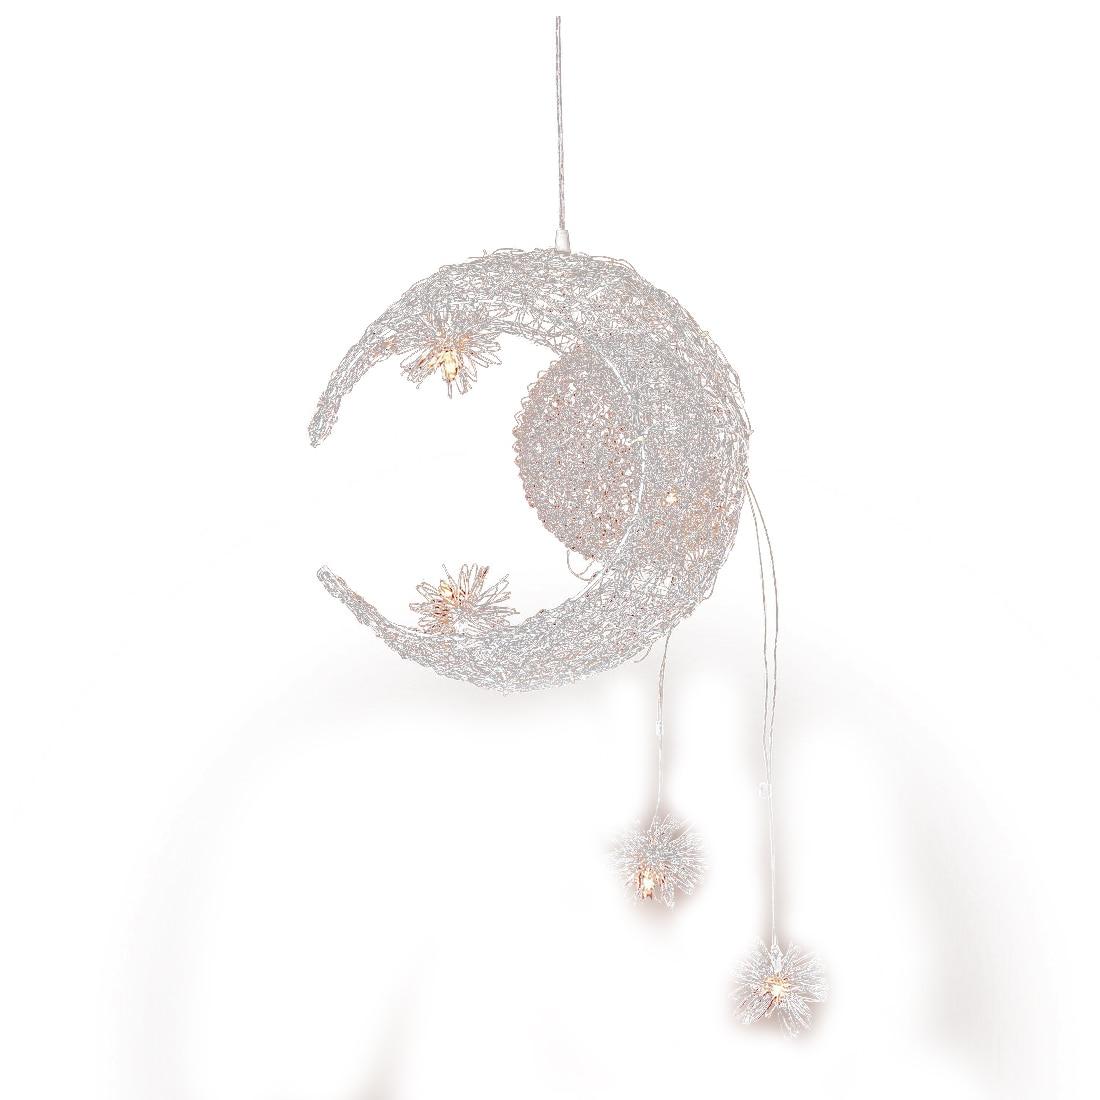 Moon & Star Sweet Bedroom Lighting Pendant Lamp Chandelier Ceiling Light Fixture moon flac jeans